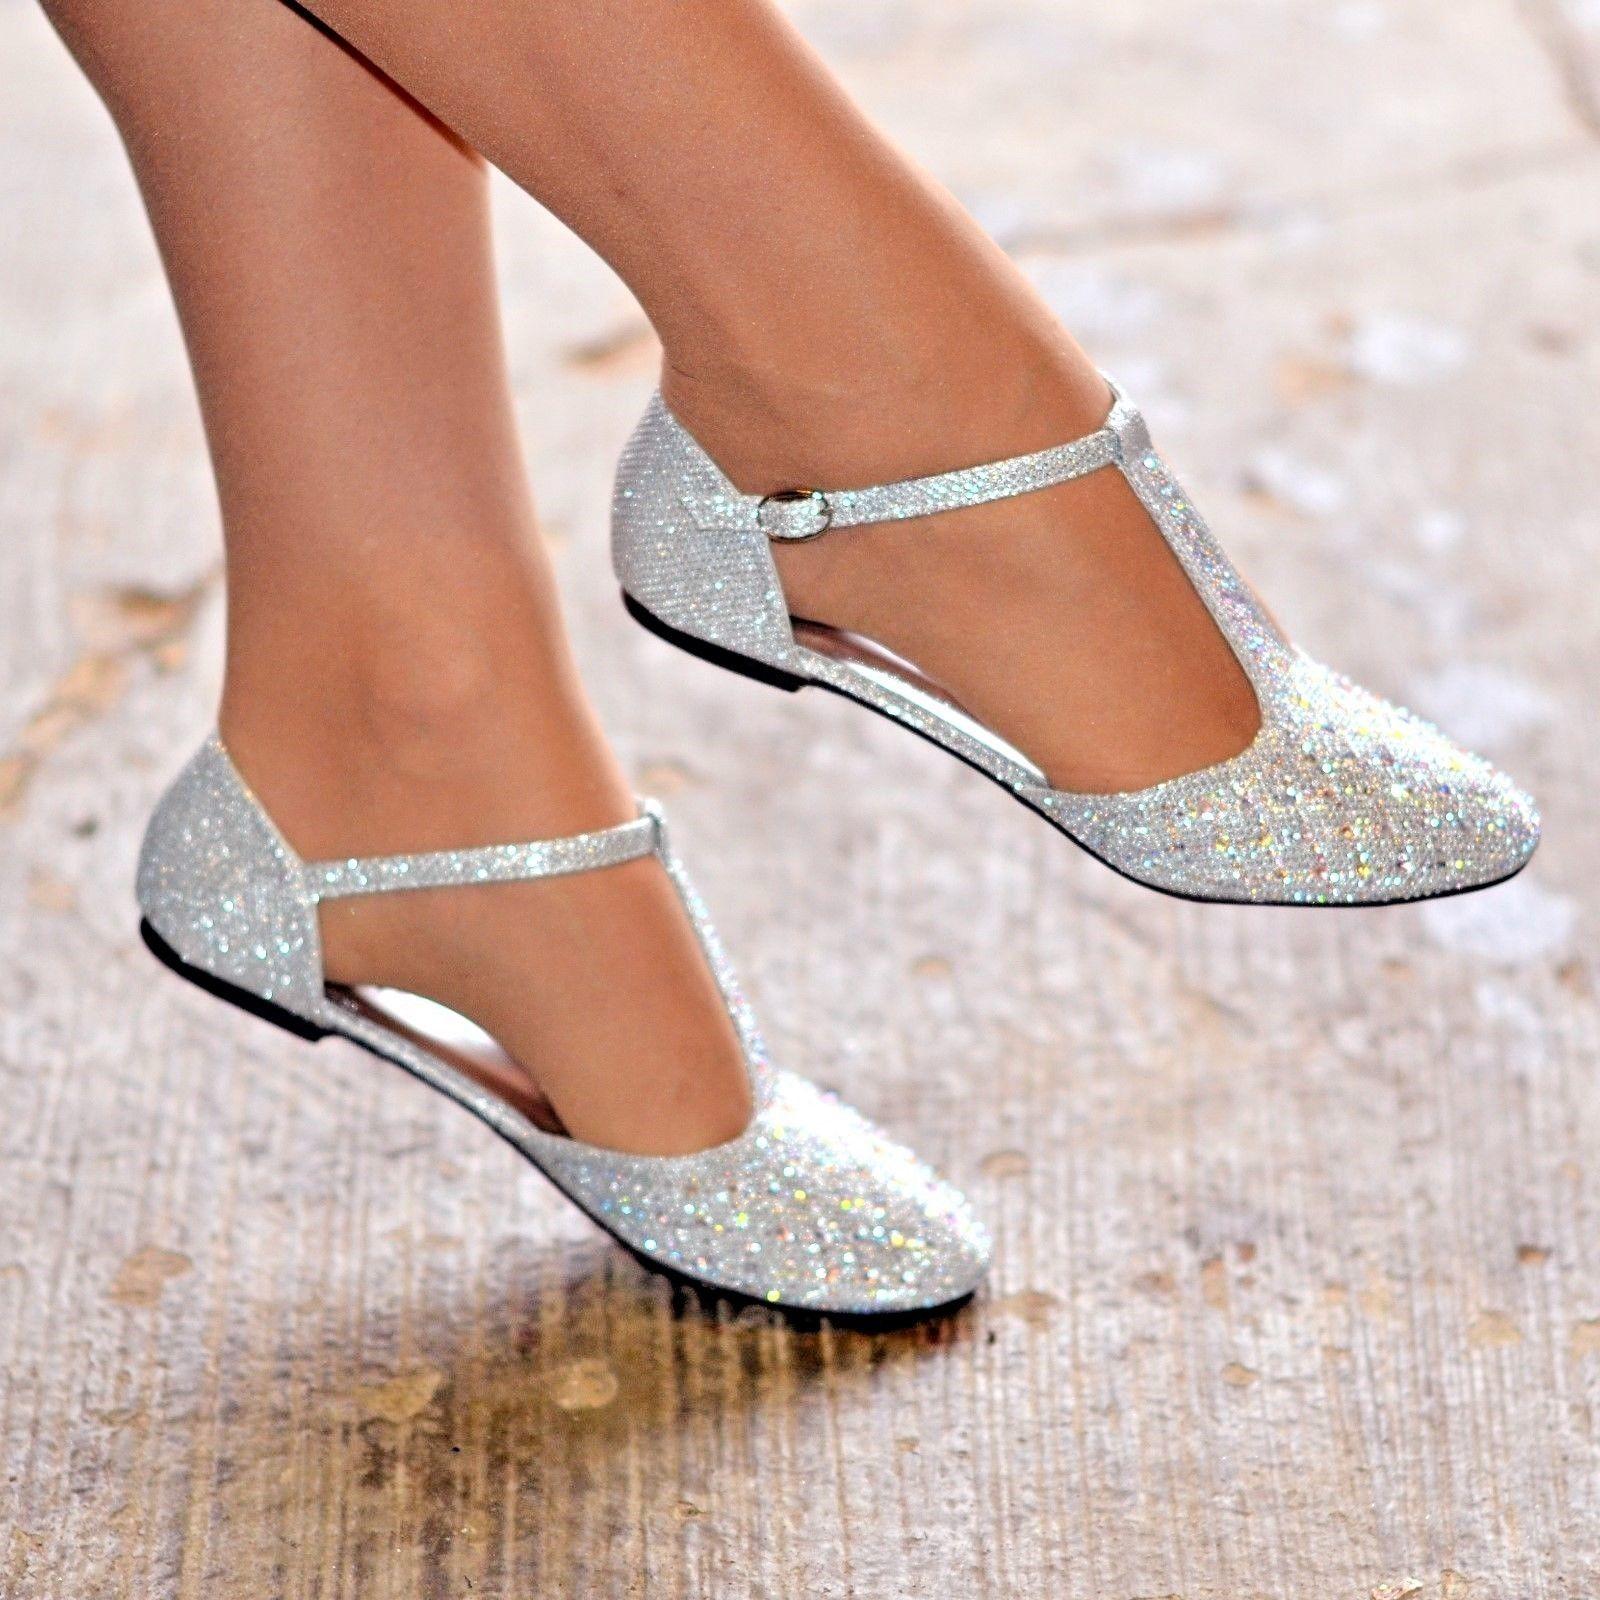 635d8aa314b73 Women Diamante Rhinestone Ballet Shoes Flats T Bar Pumps Prom Wedding  Evening | eBay